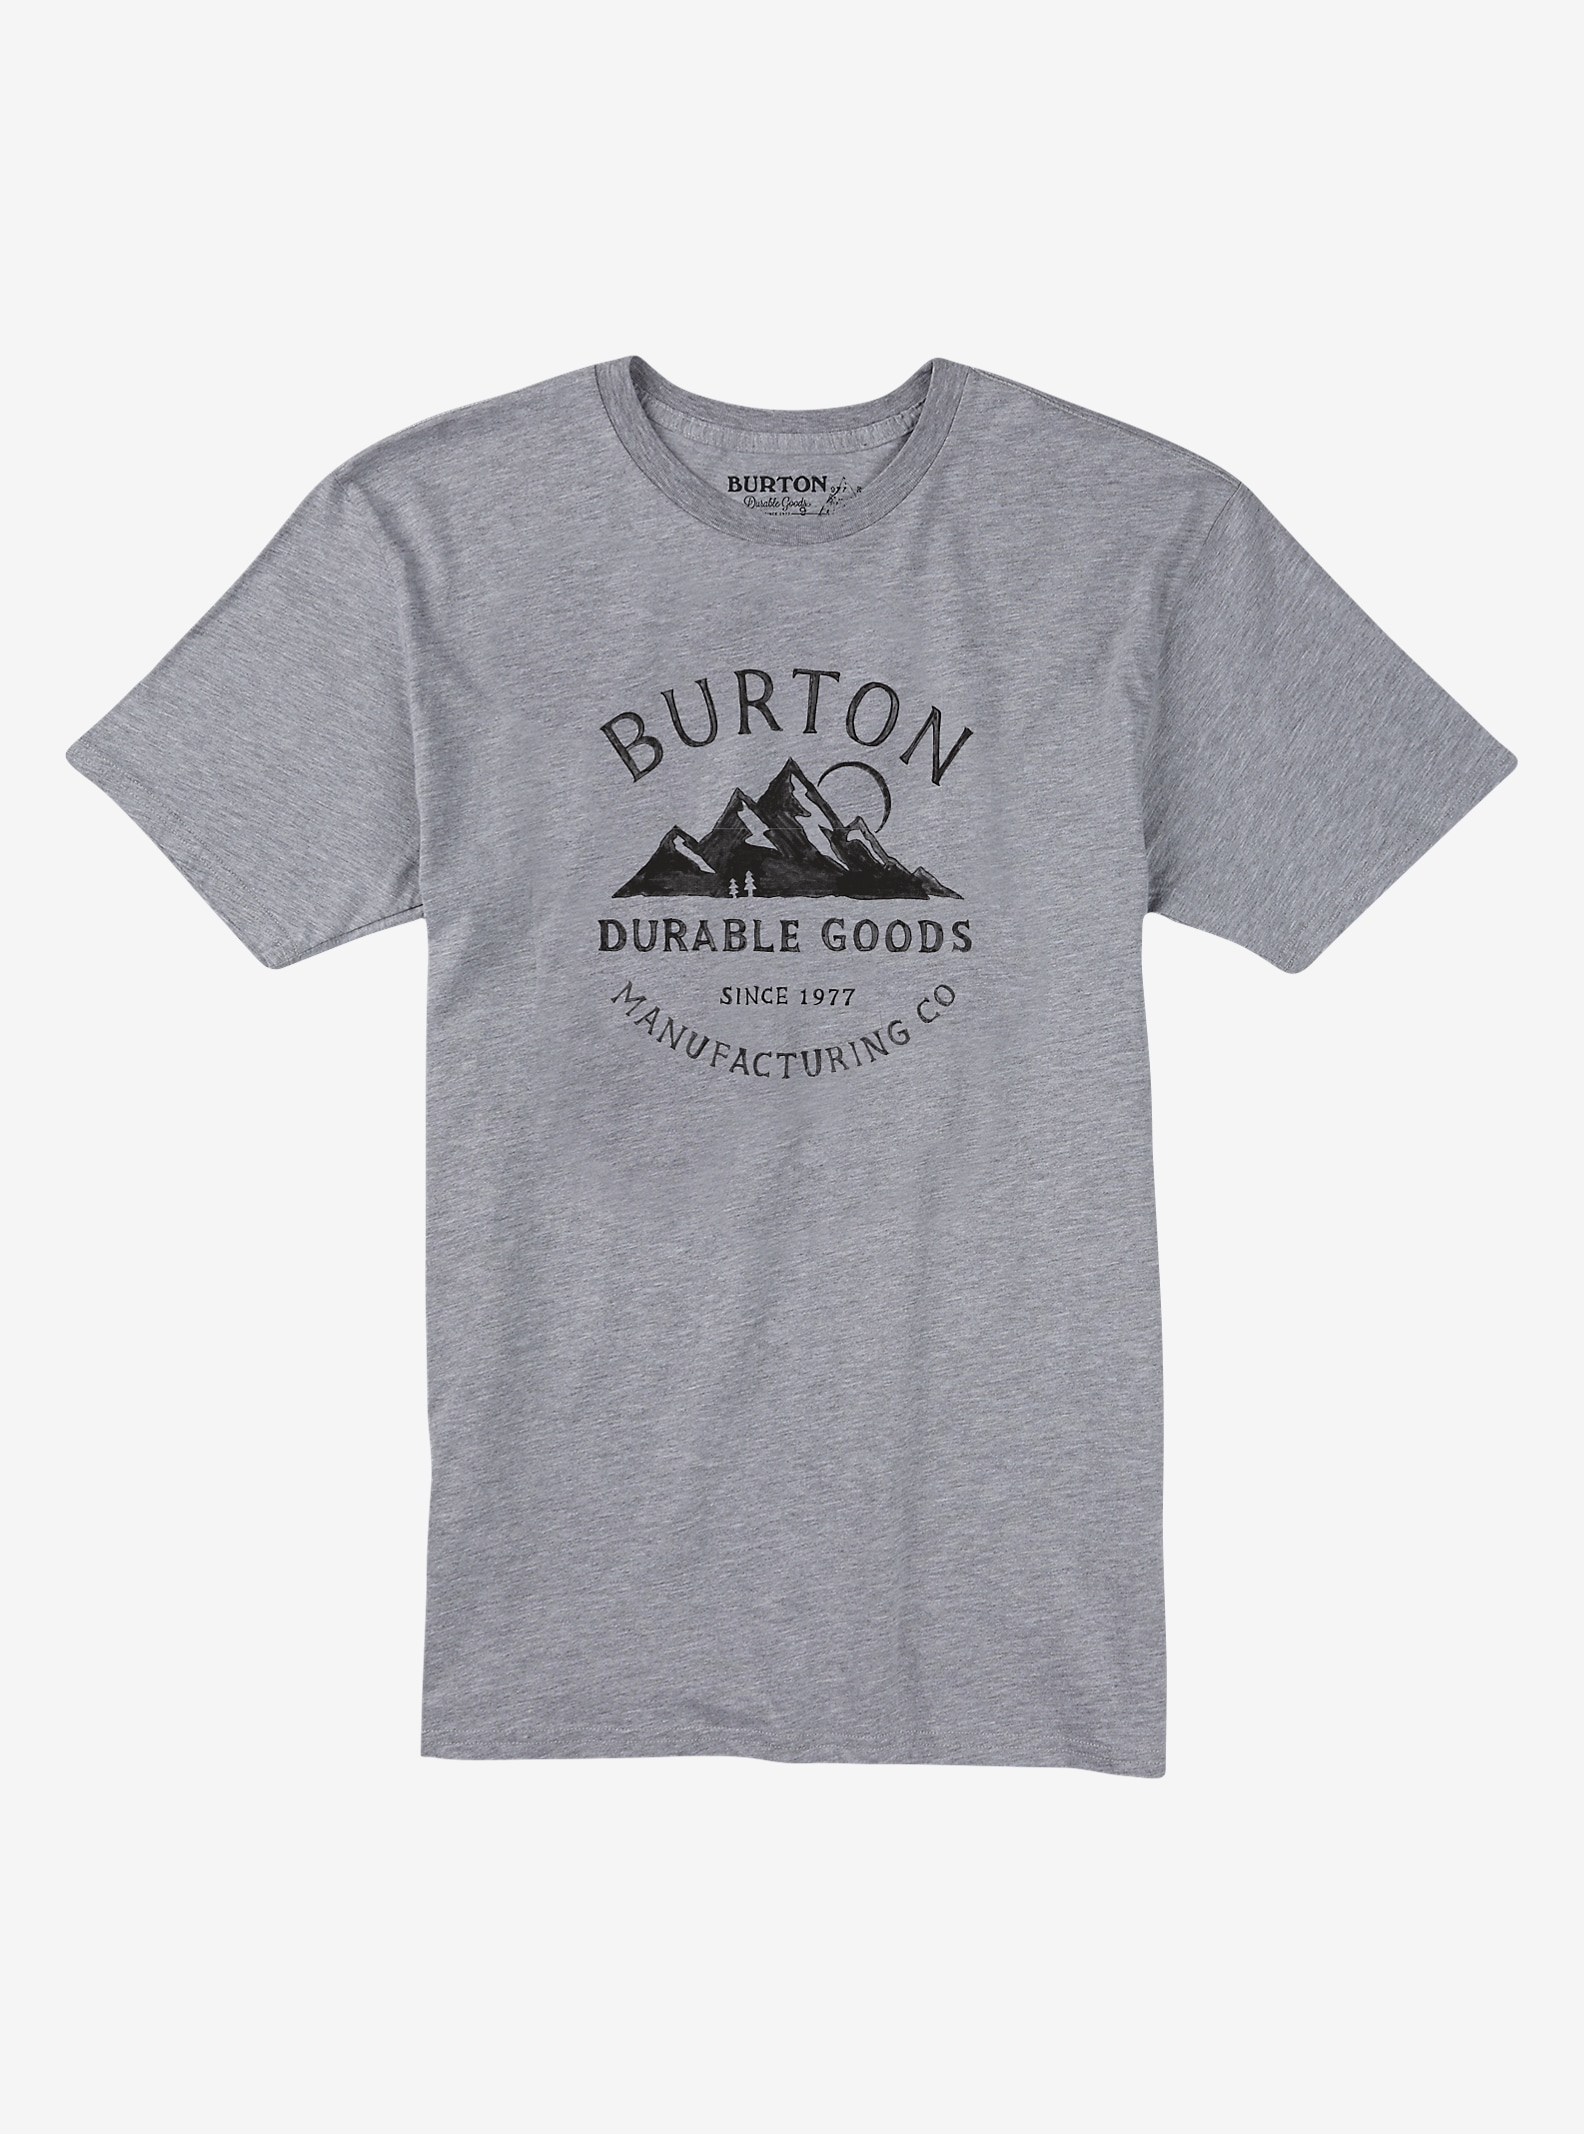 Burton Overlook Short Sleeve T Shirt shown in Gray Heather